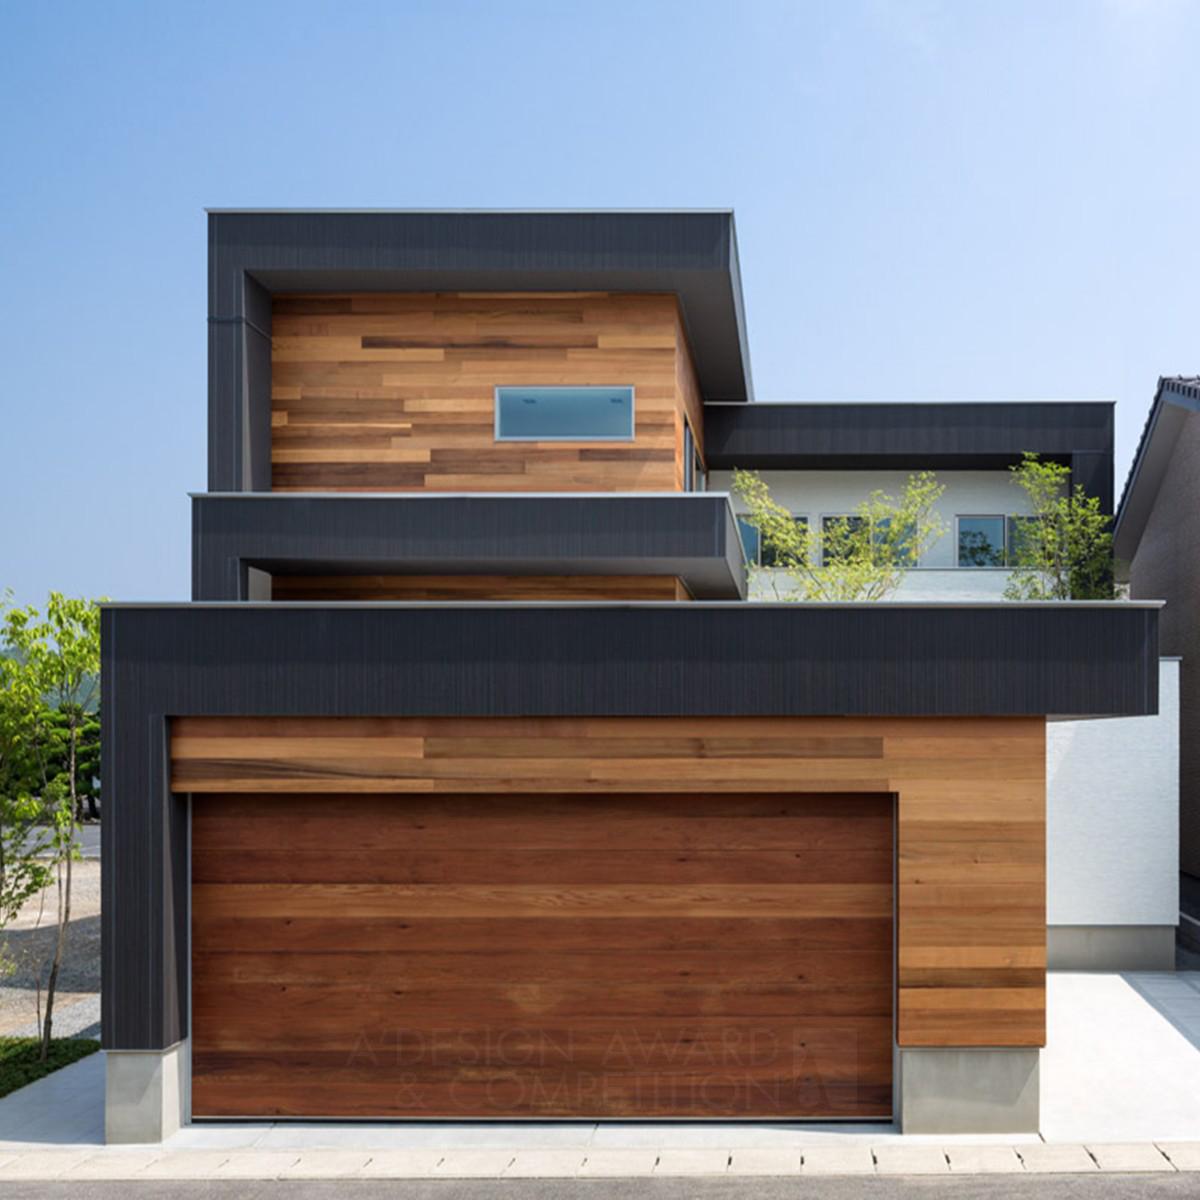 M4-house [ House of Overlap ] House